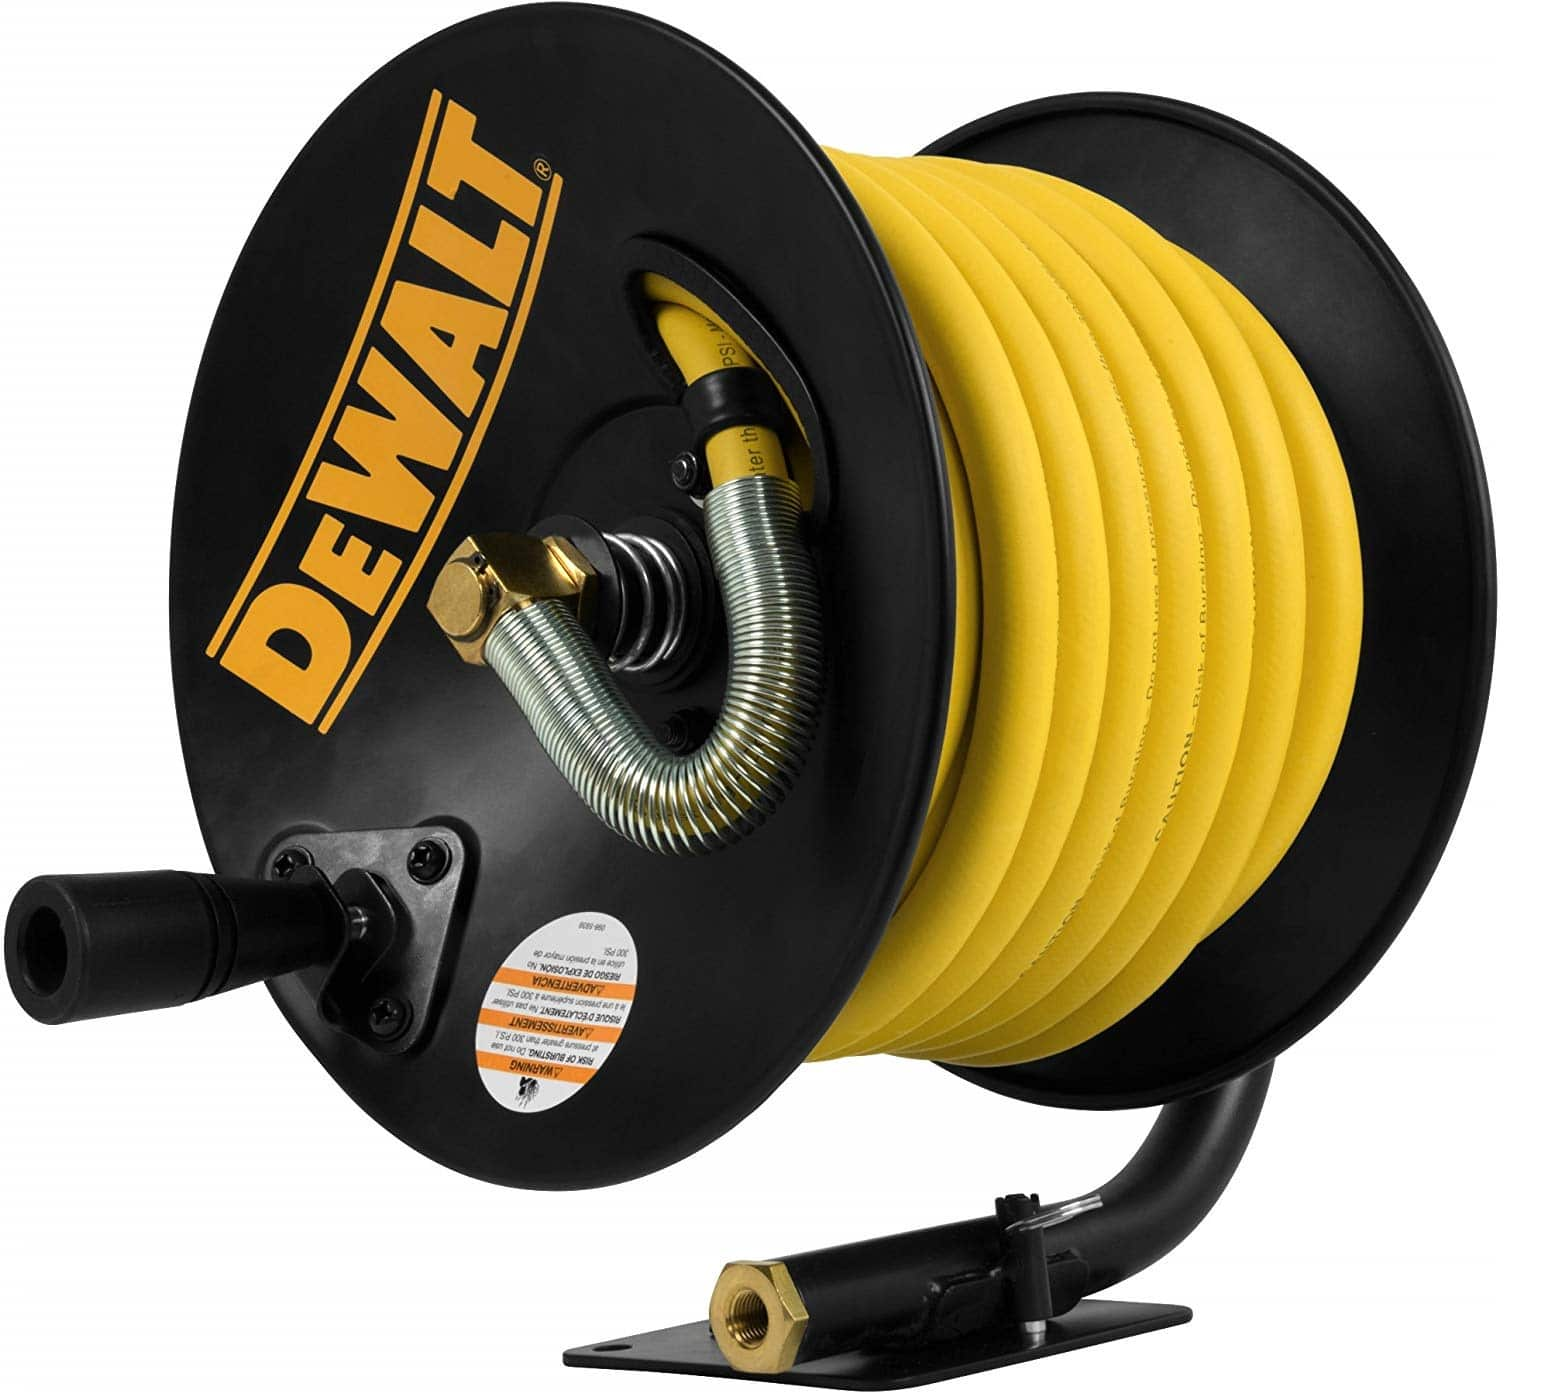 10.DeWalt DXCM024-0348 3 8 x 50' Manual Hose Reel with Rubber Hose